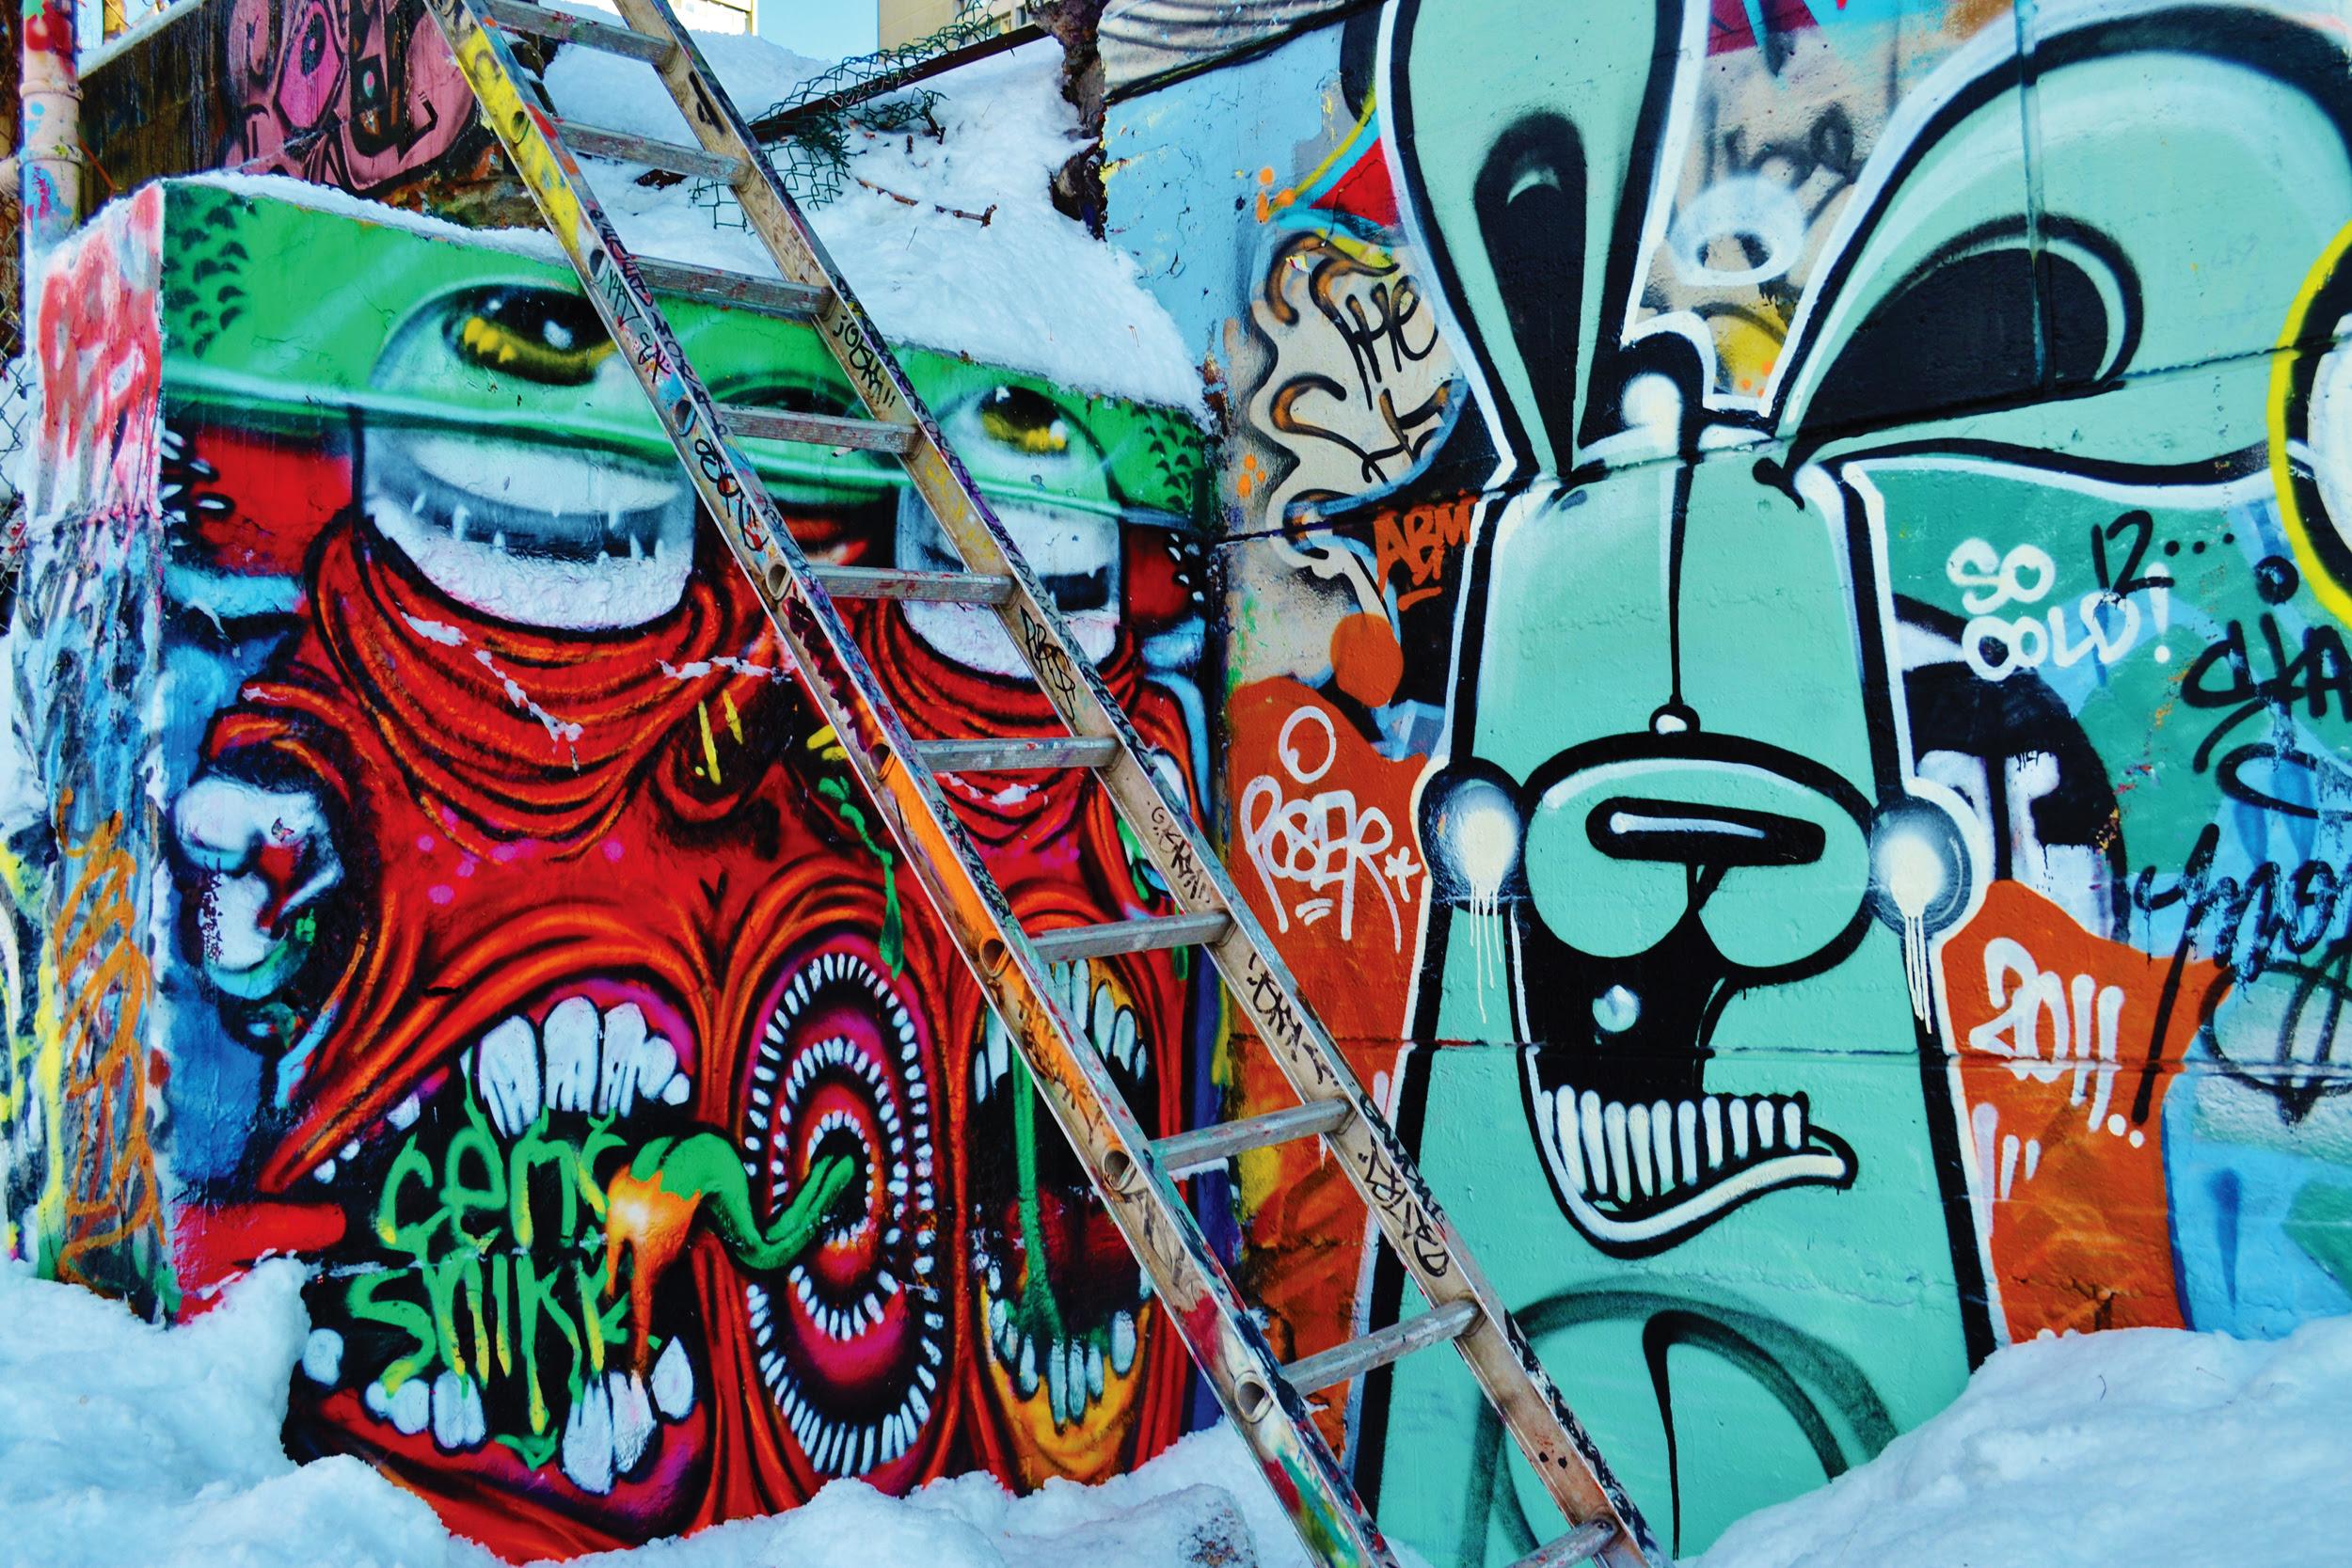 ARTS_Graffitti_Yolande Winegarden